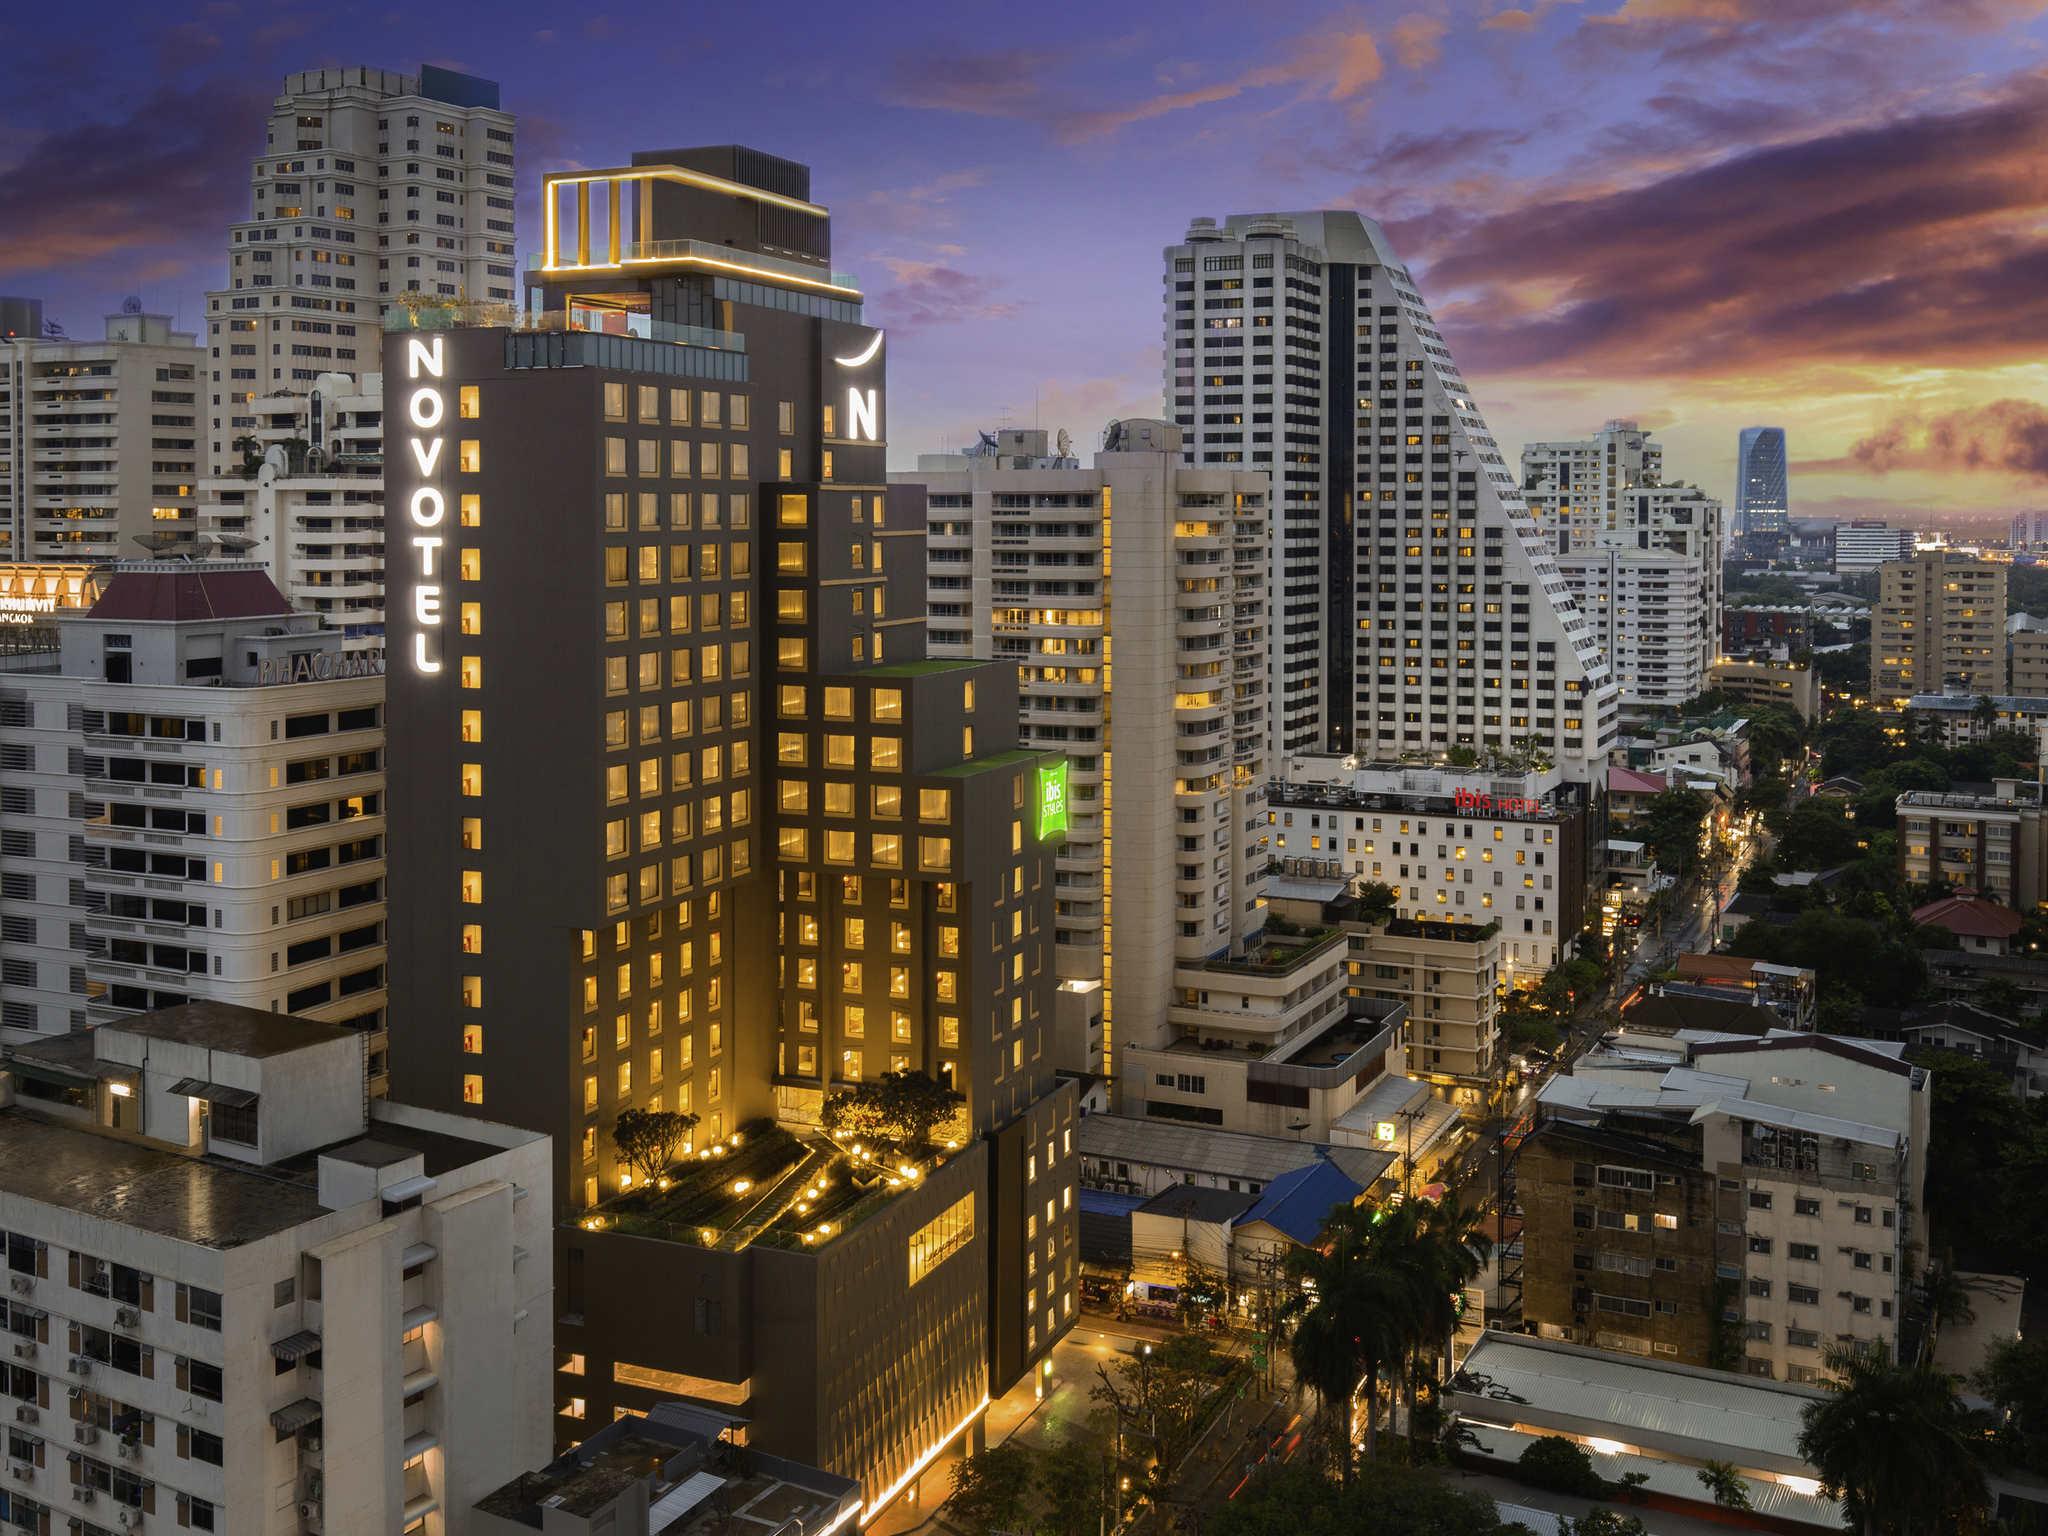 Hôtel - Novotel Bangkok Sukhumvit 4 (ouverture en octobre 2018)